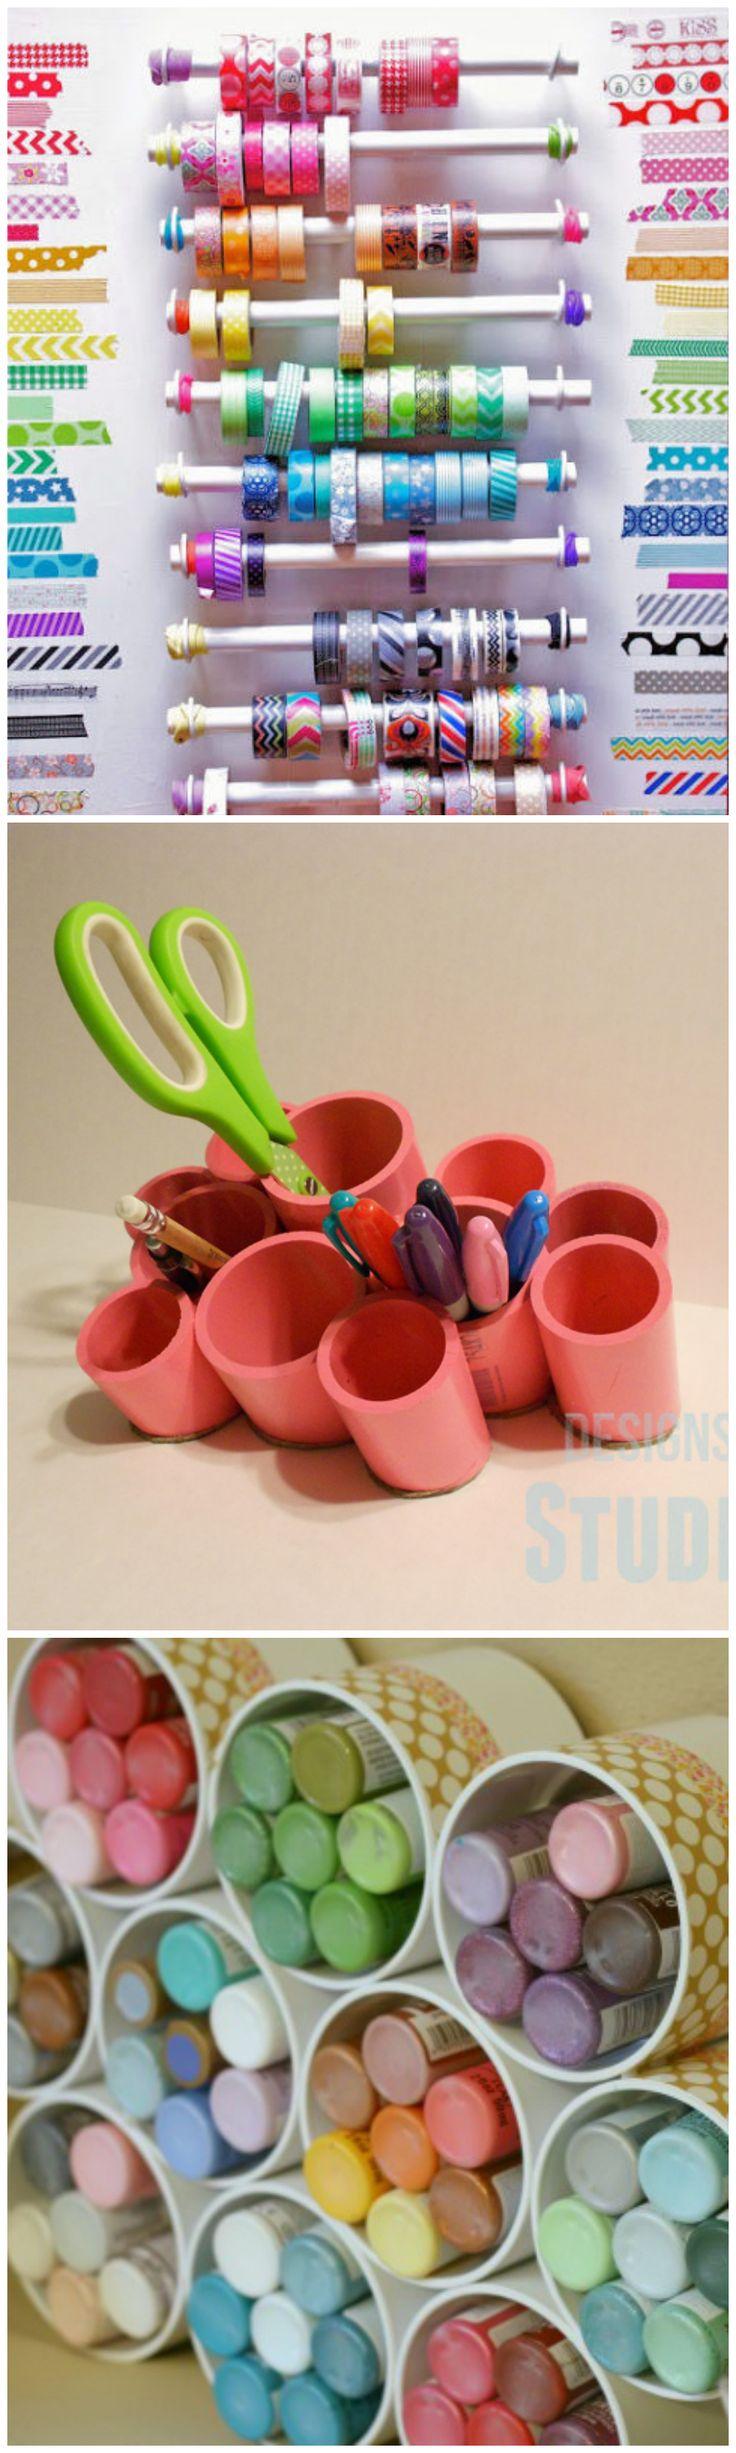 Craft supplies organization ideas - 9 Genius Ways To Organize Everything With Pvc Pipe